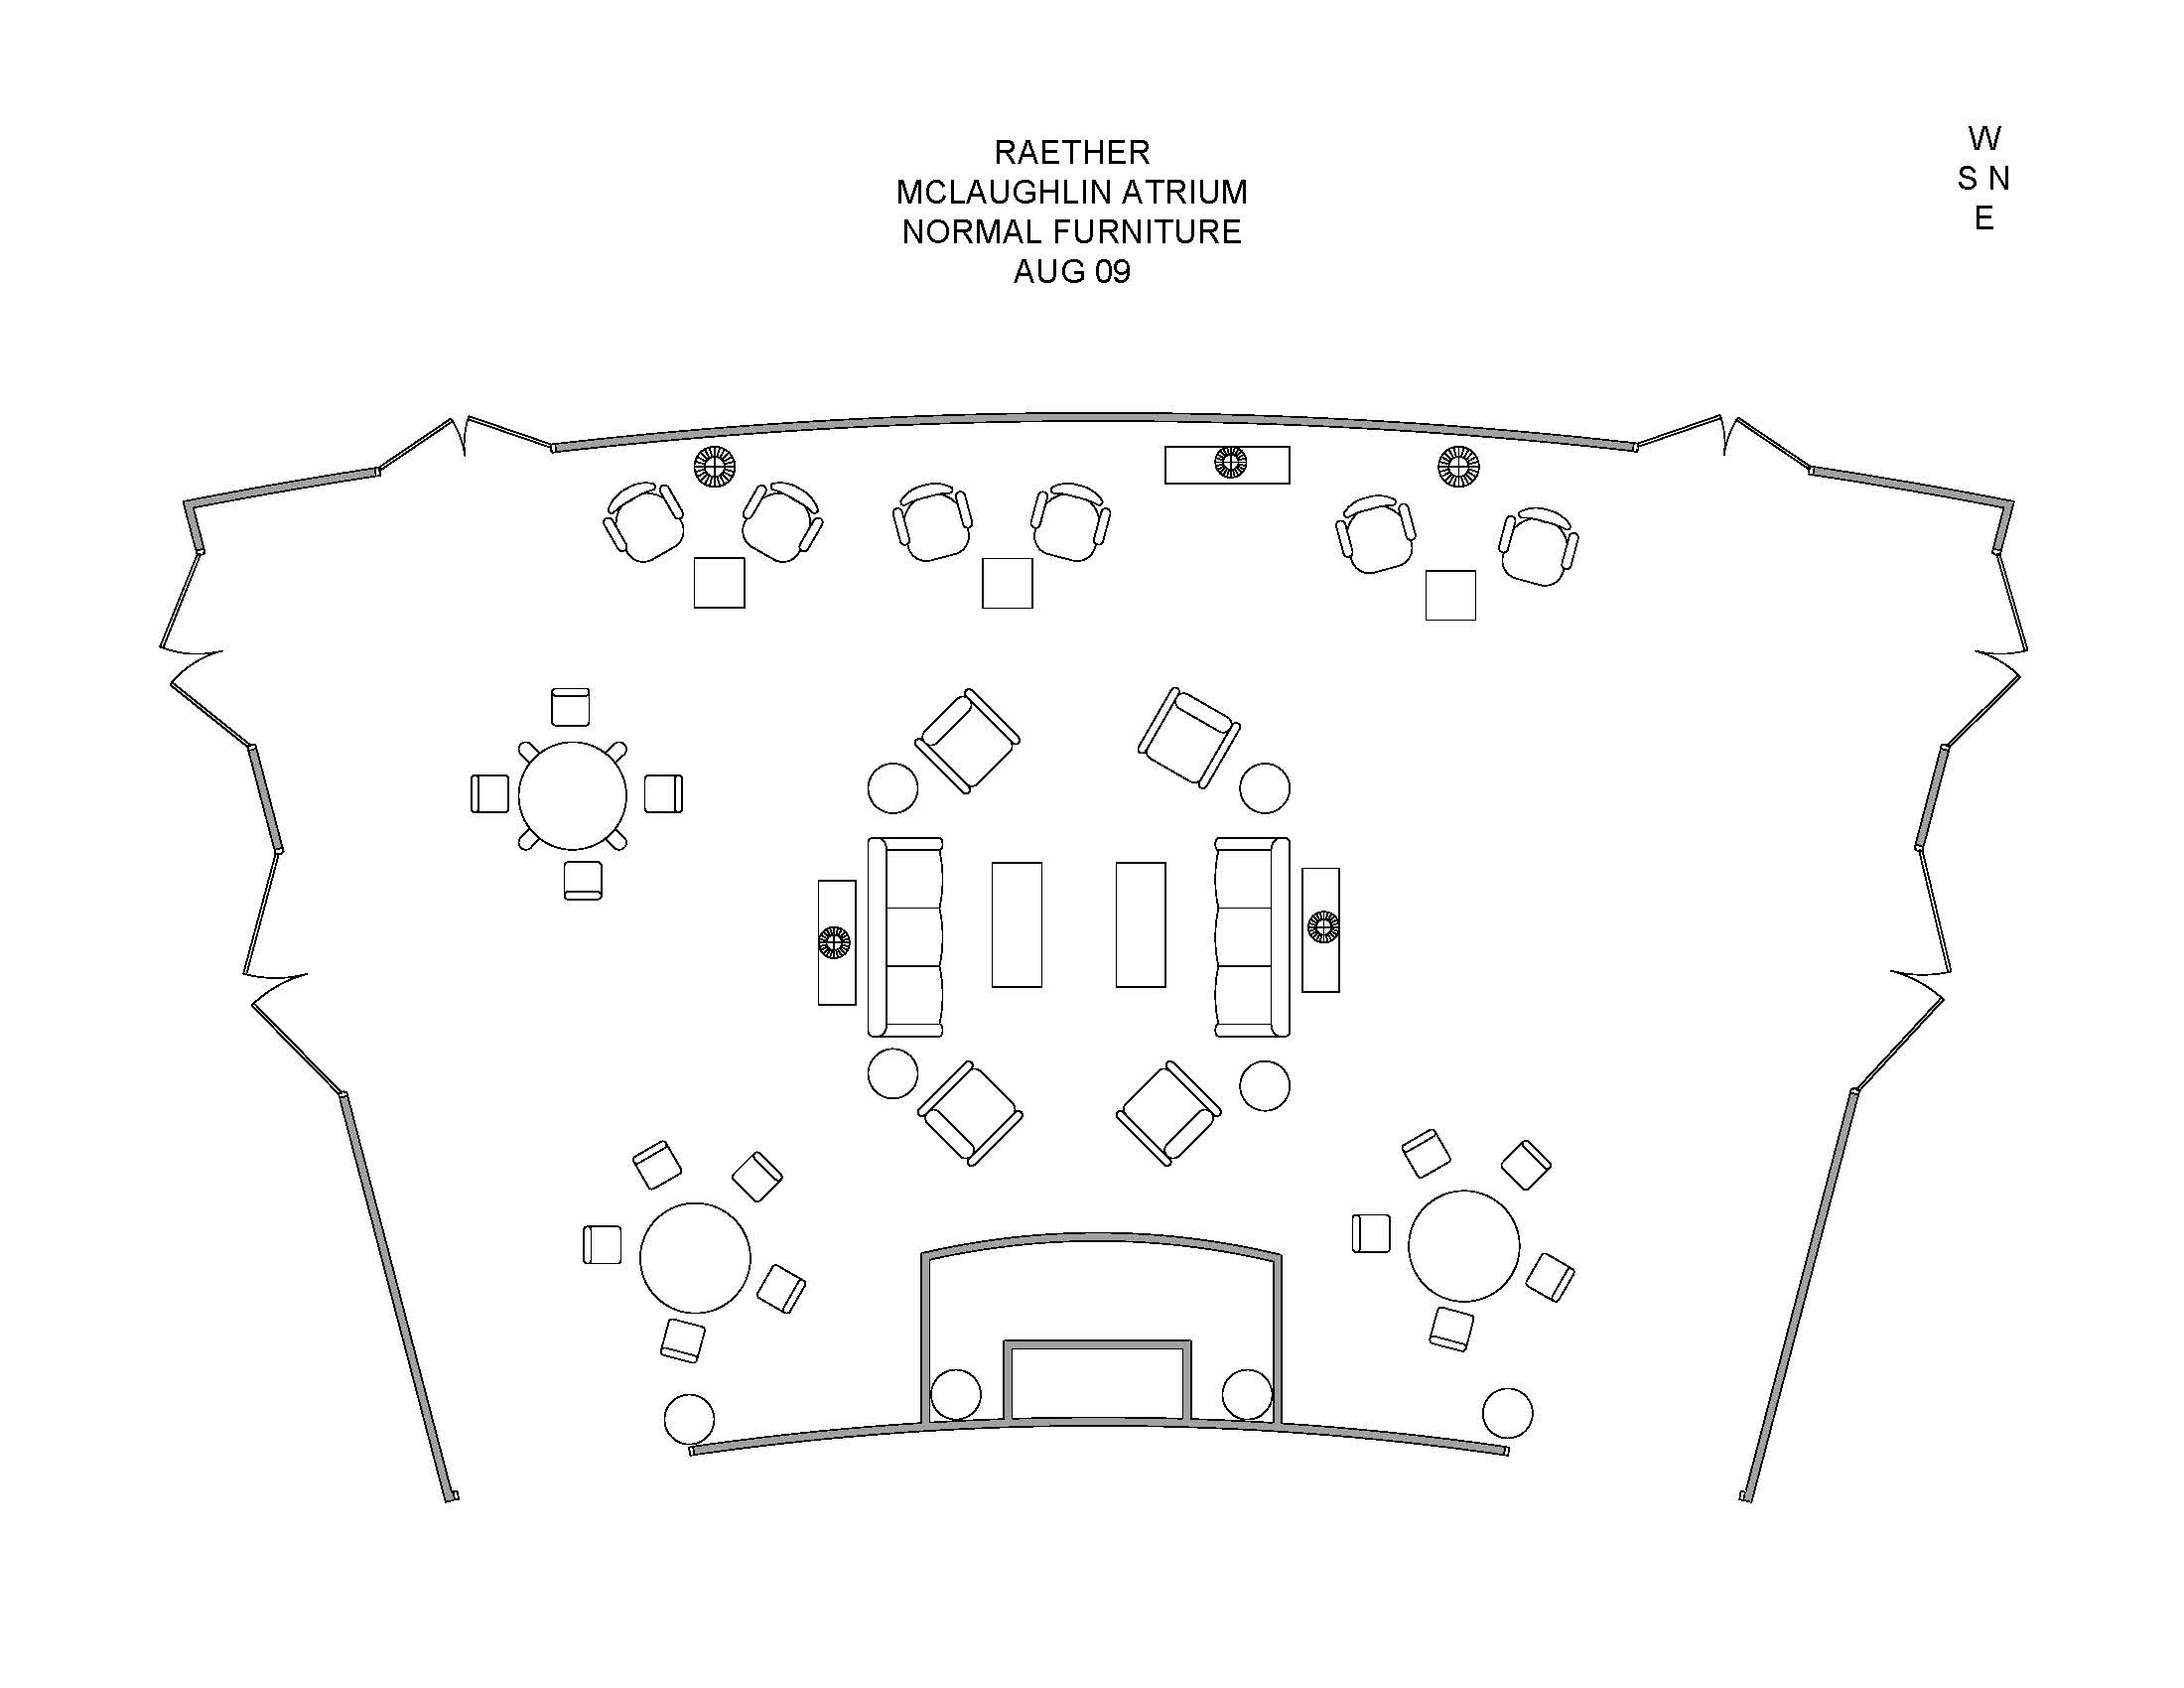 Tuck Events Amp Facilities Raether Mclaughlin Atrium Diagrams